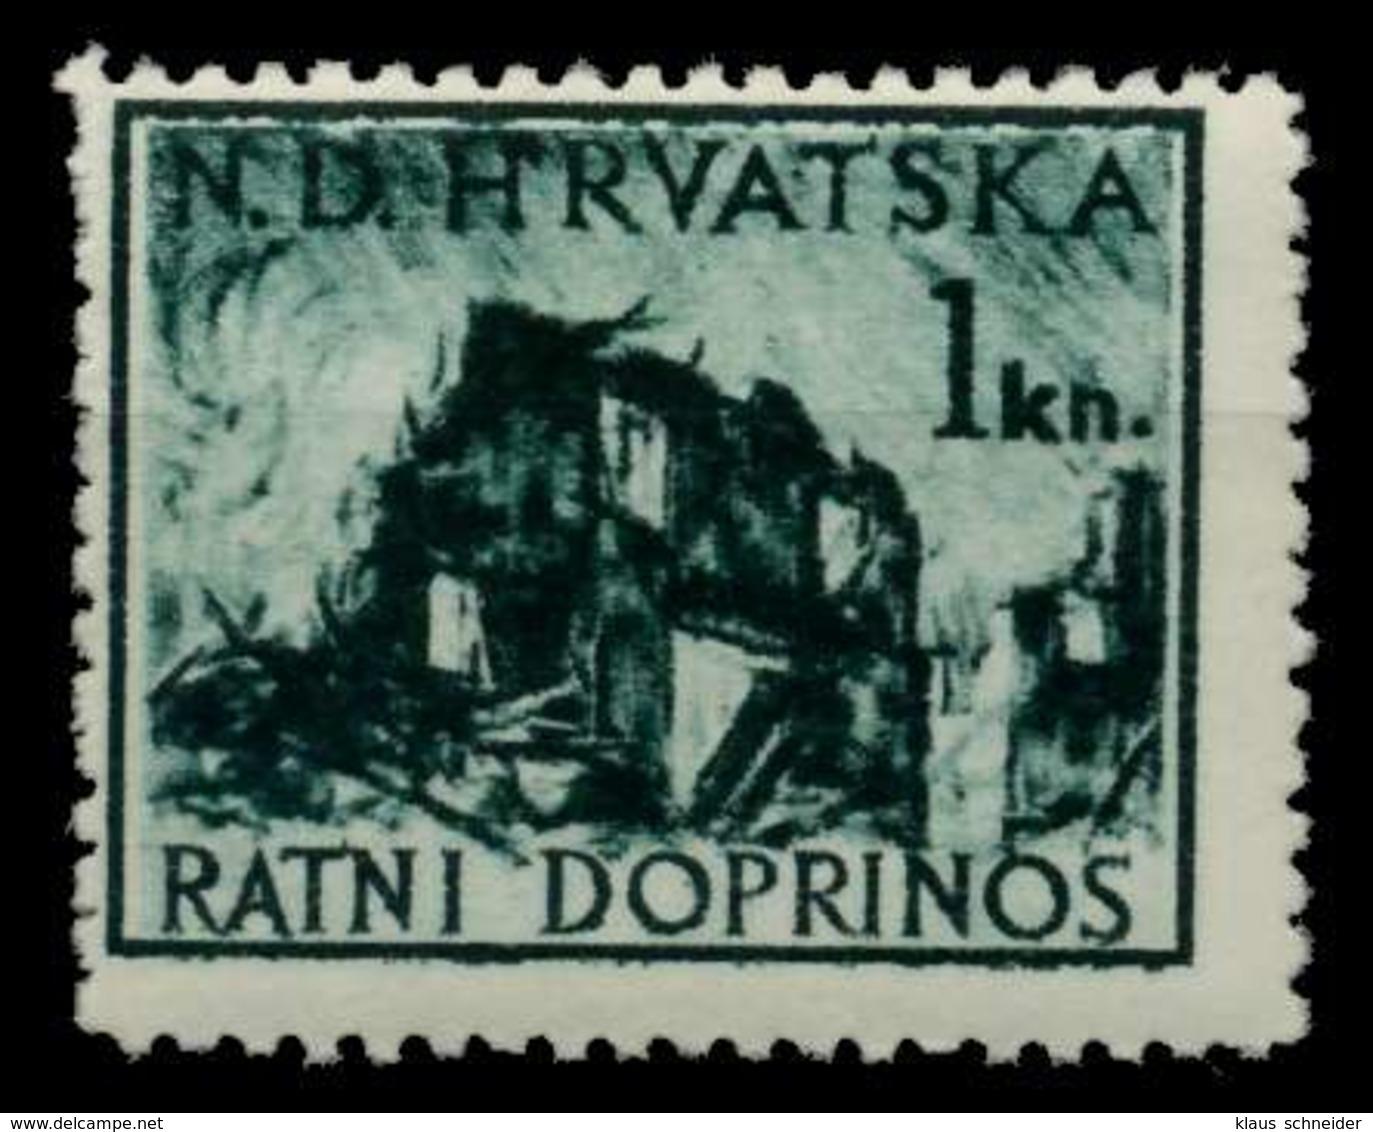 KROATIEN ZWANGSZL Nr 3 Postfrisch X92566E - Croazia